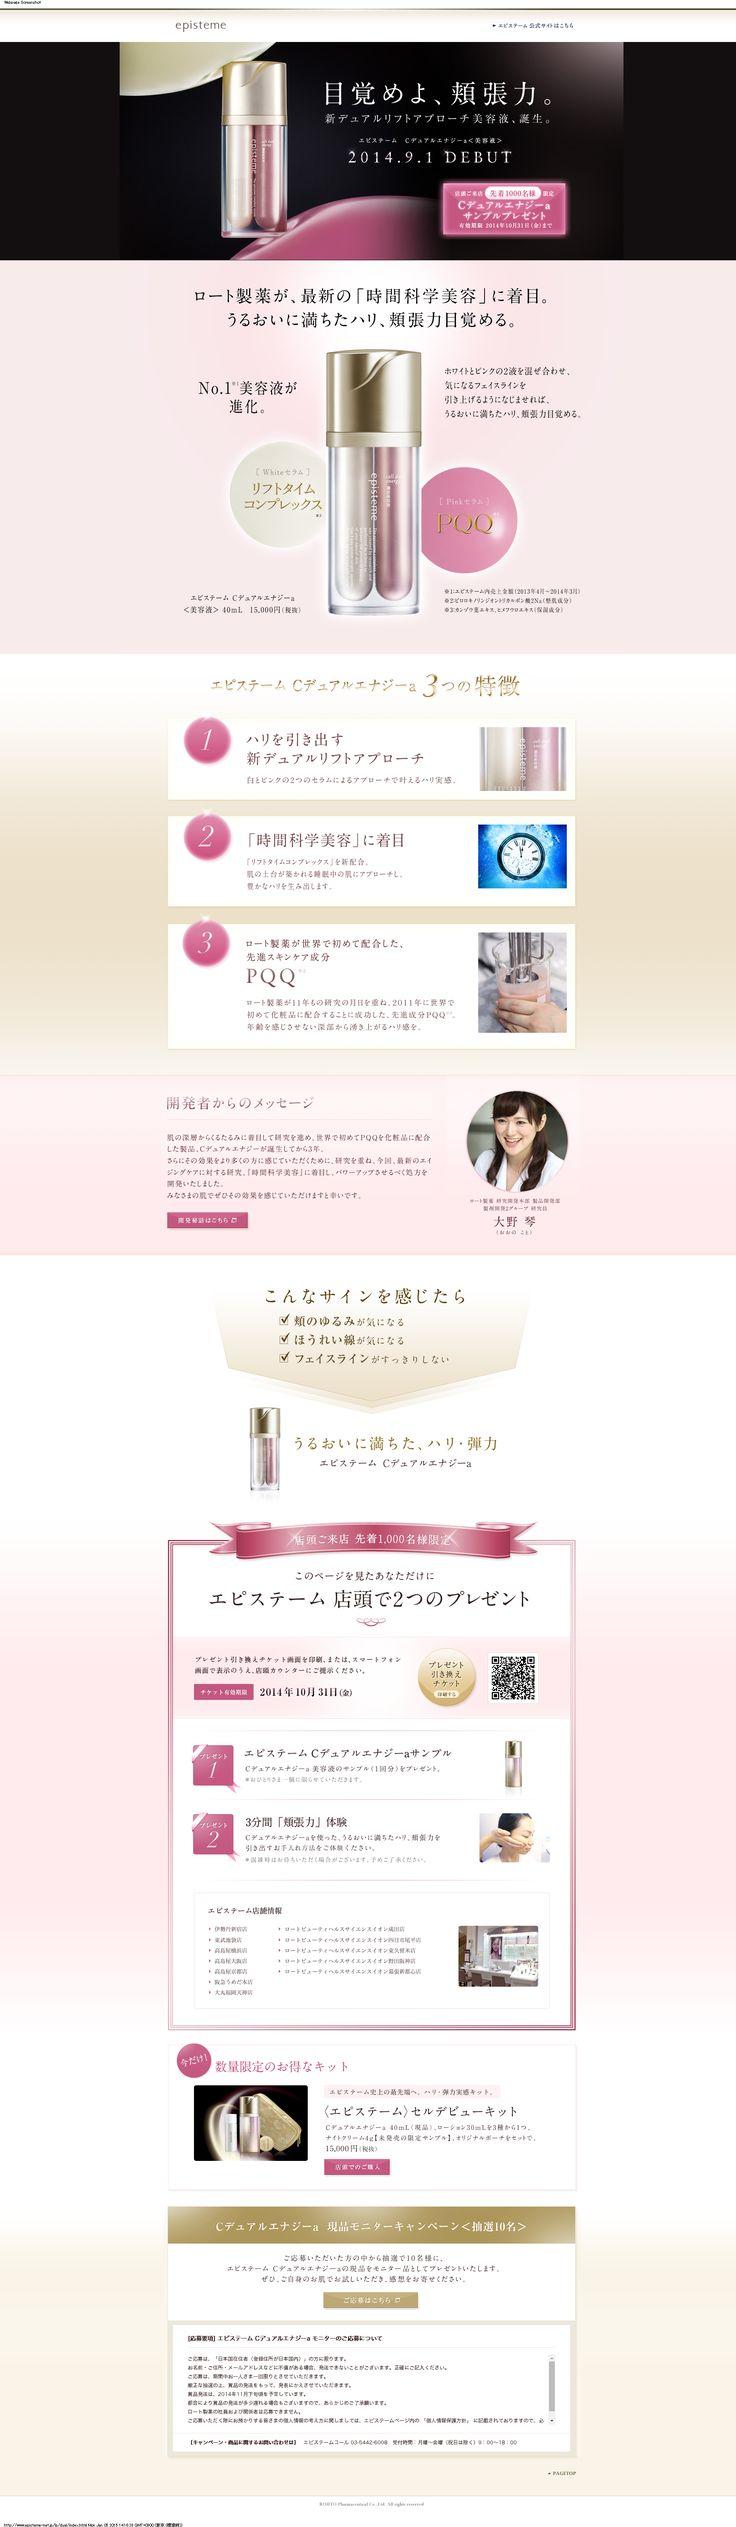 japan | e-commerce | landing page LP | cosmetic | web design | Layout |